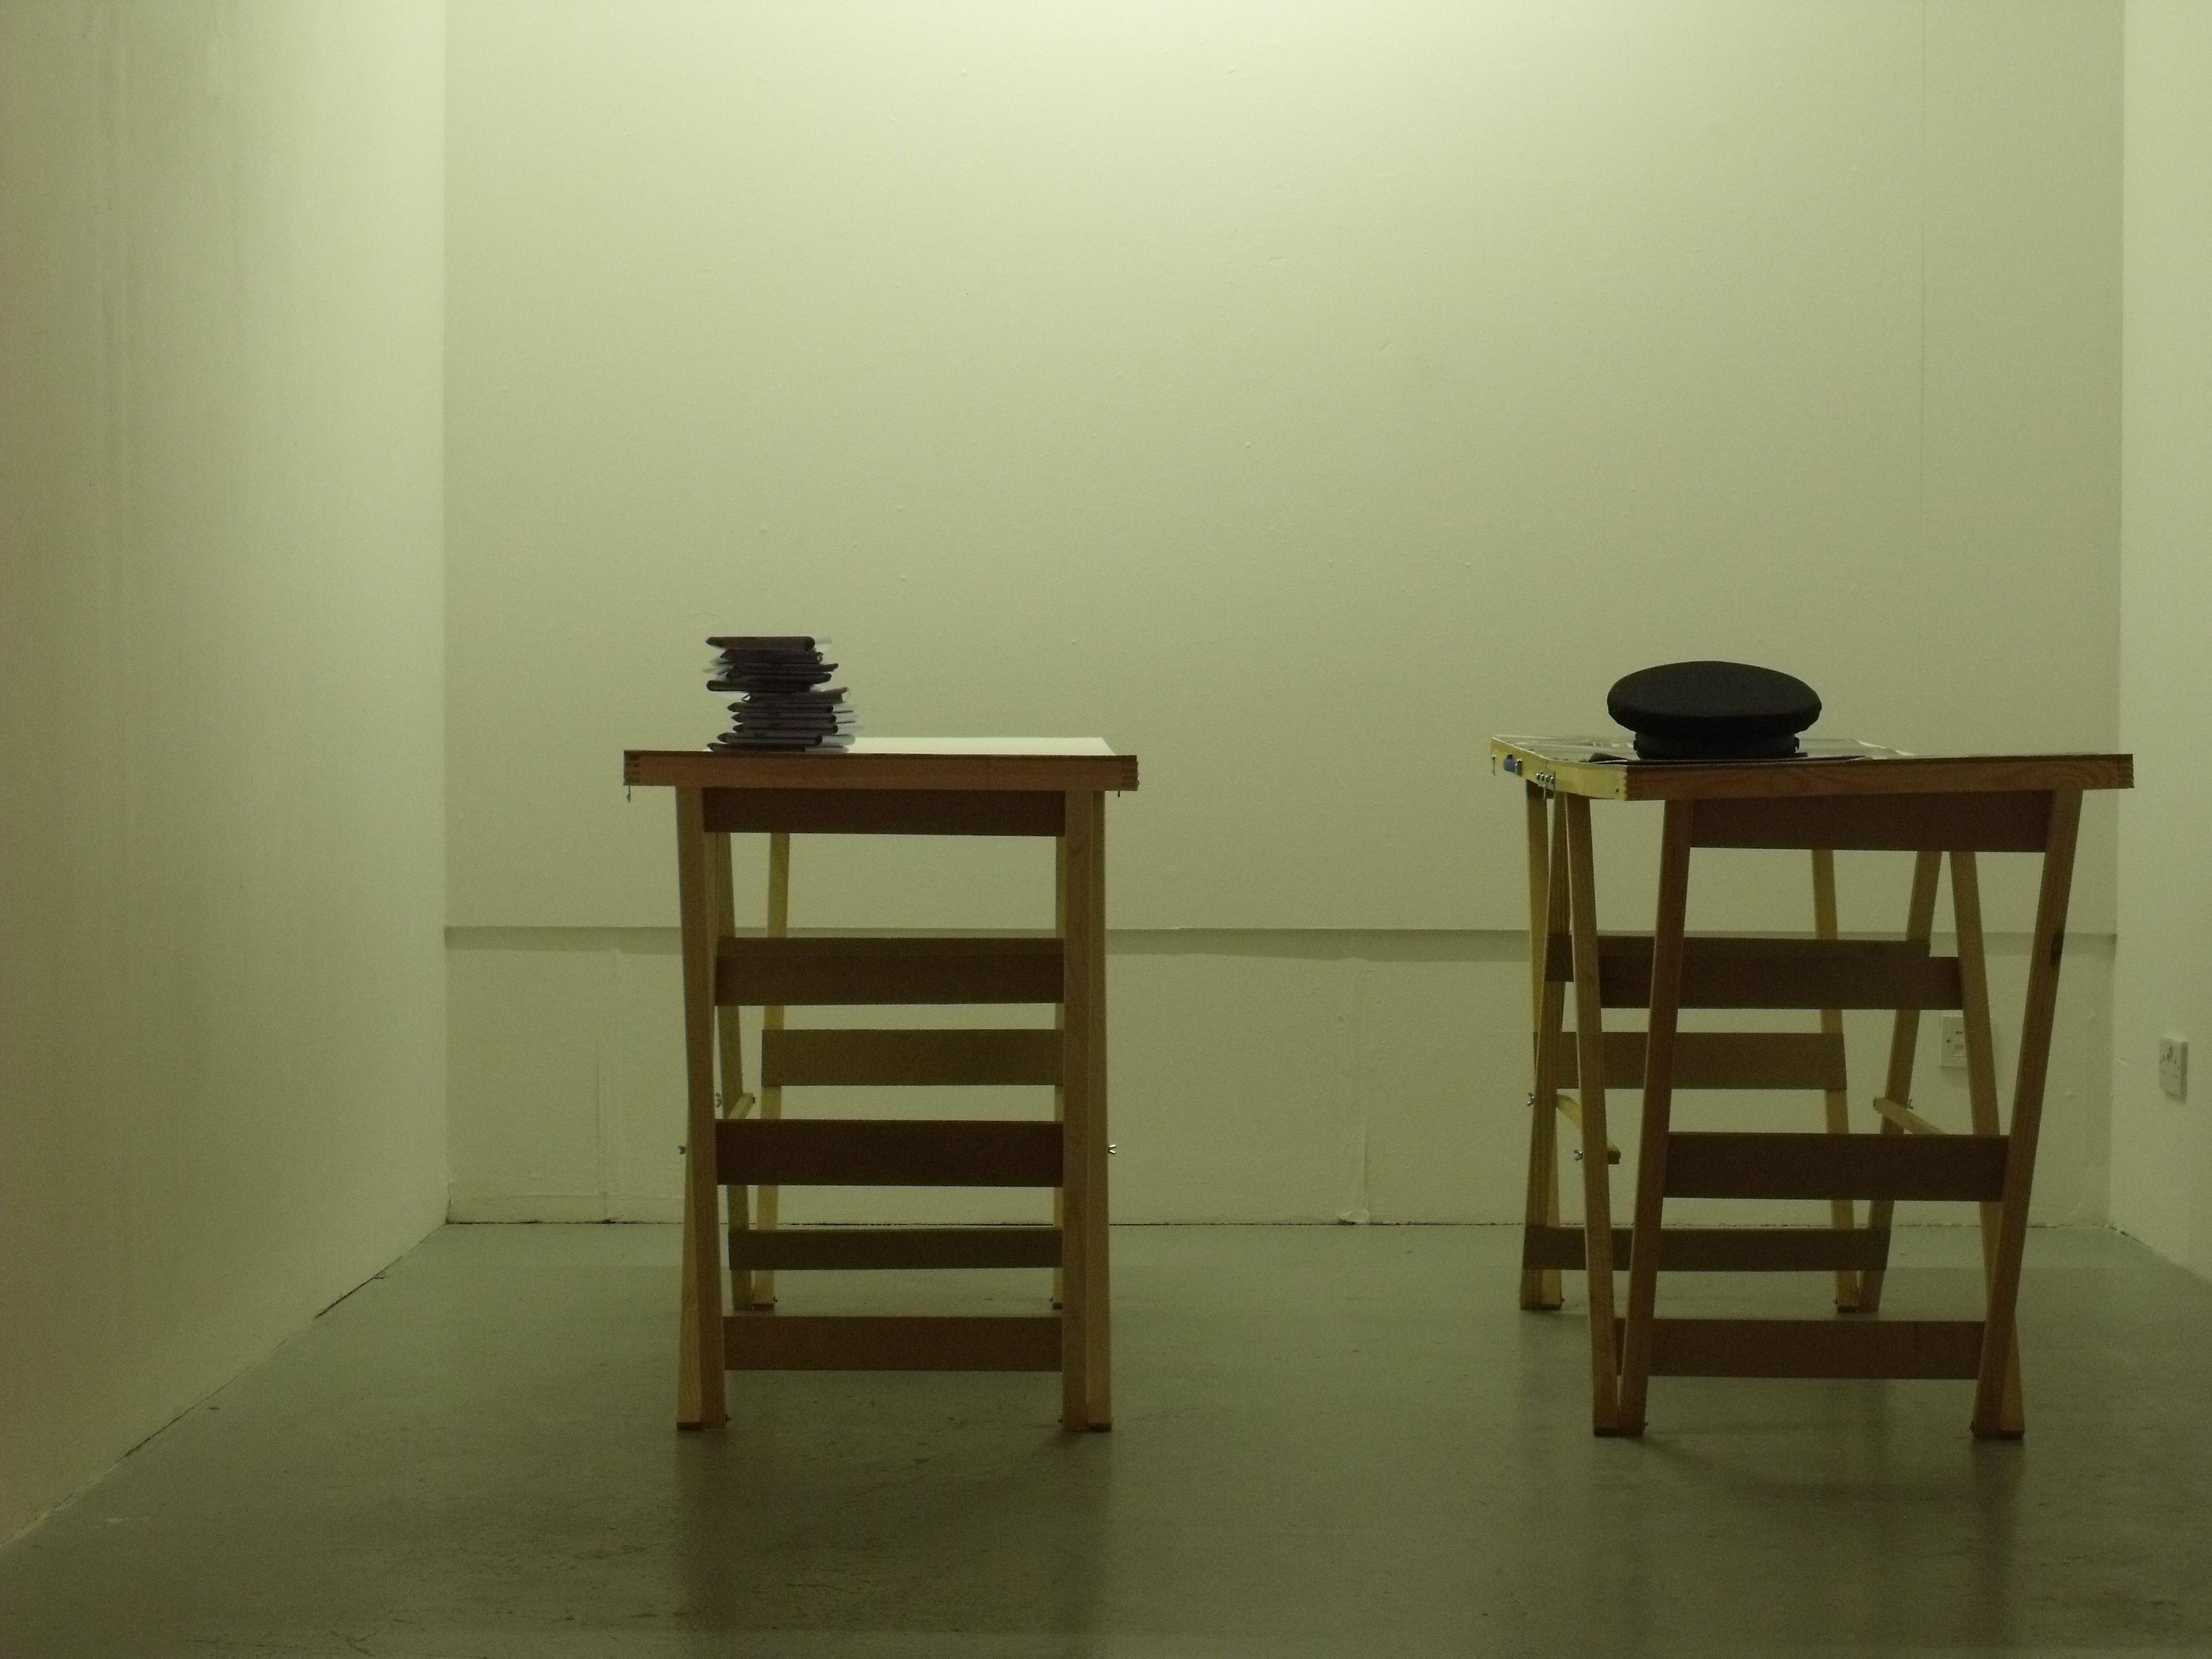 Contra-Invention installation shots